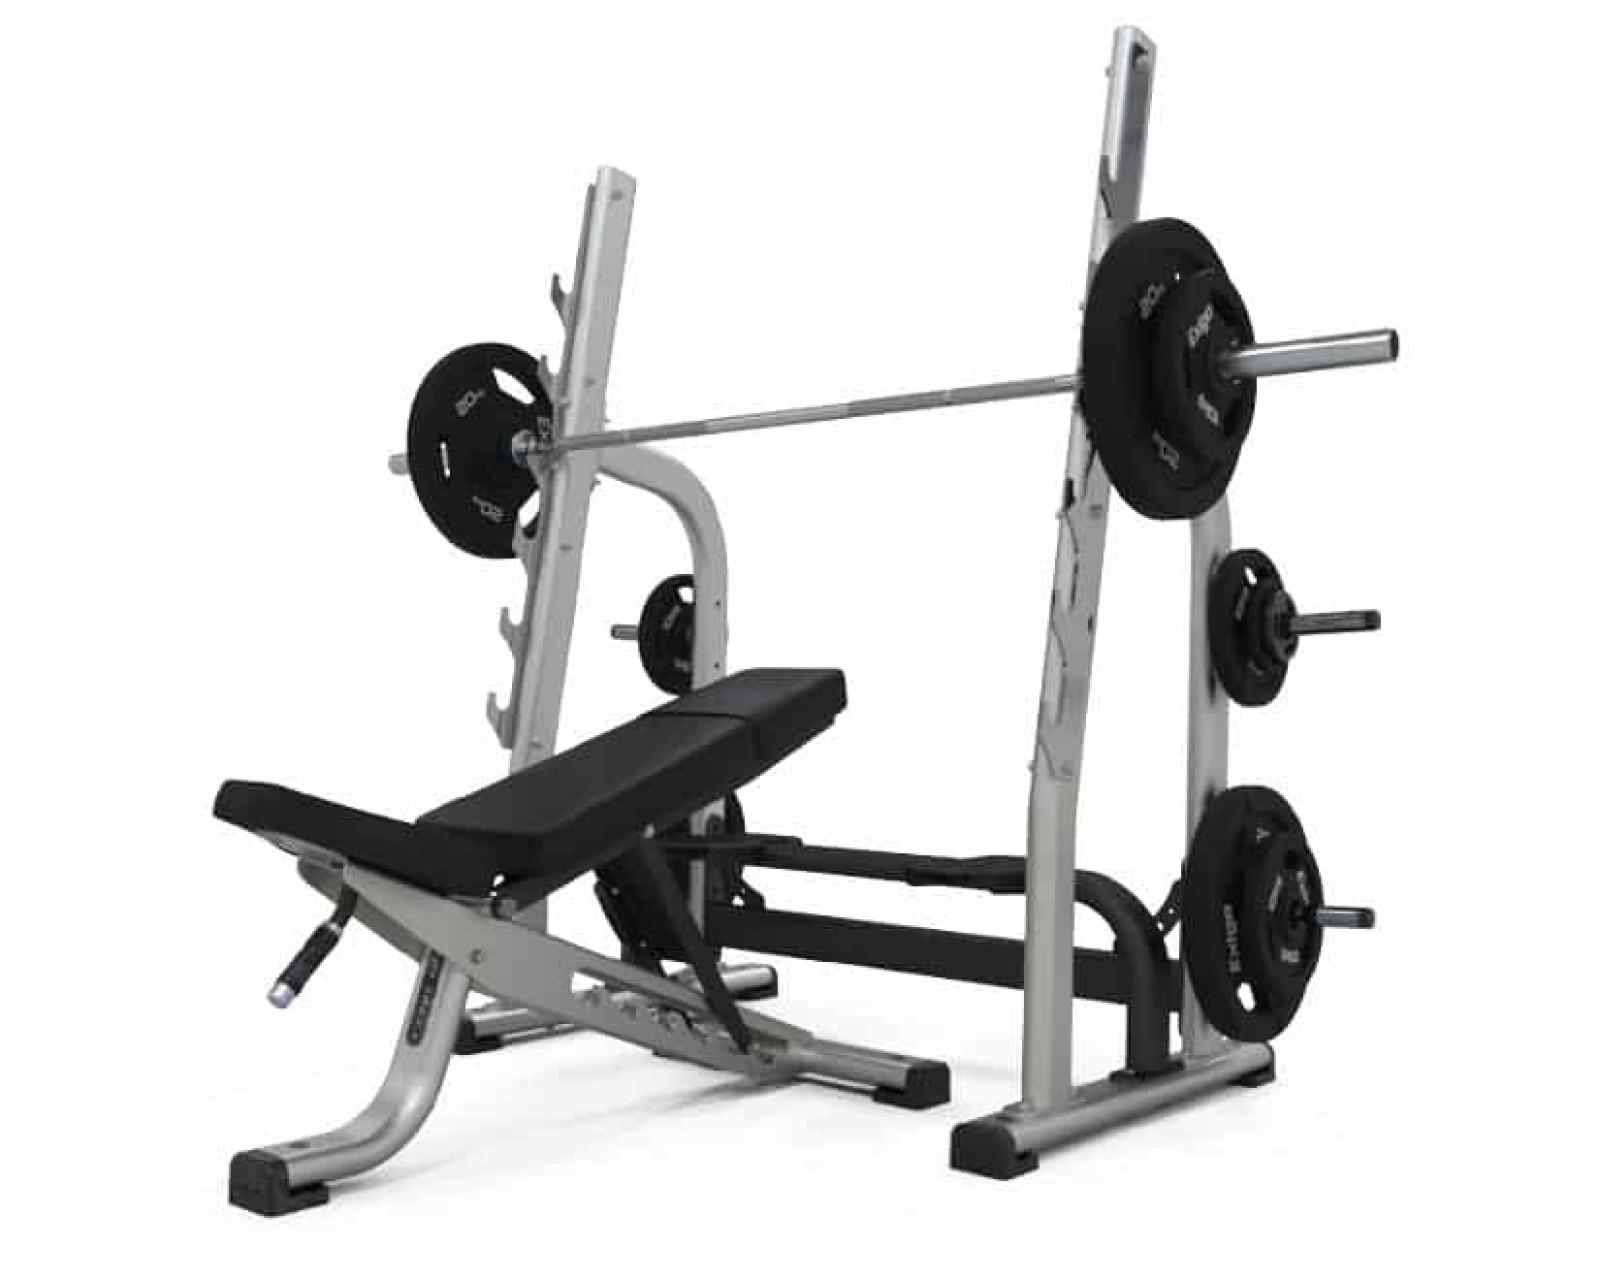 Exigo Uk Commercial Smith Machine Olympic Bar Weight Lifting Gym New In Stock Power Racks Smith Machines Sporting Goods